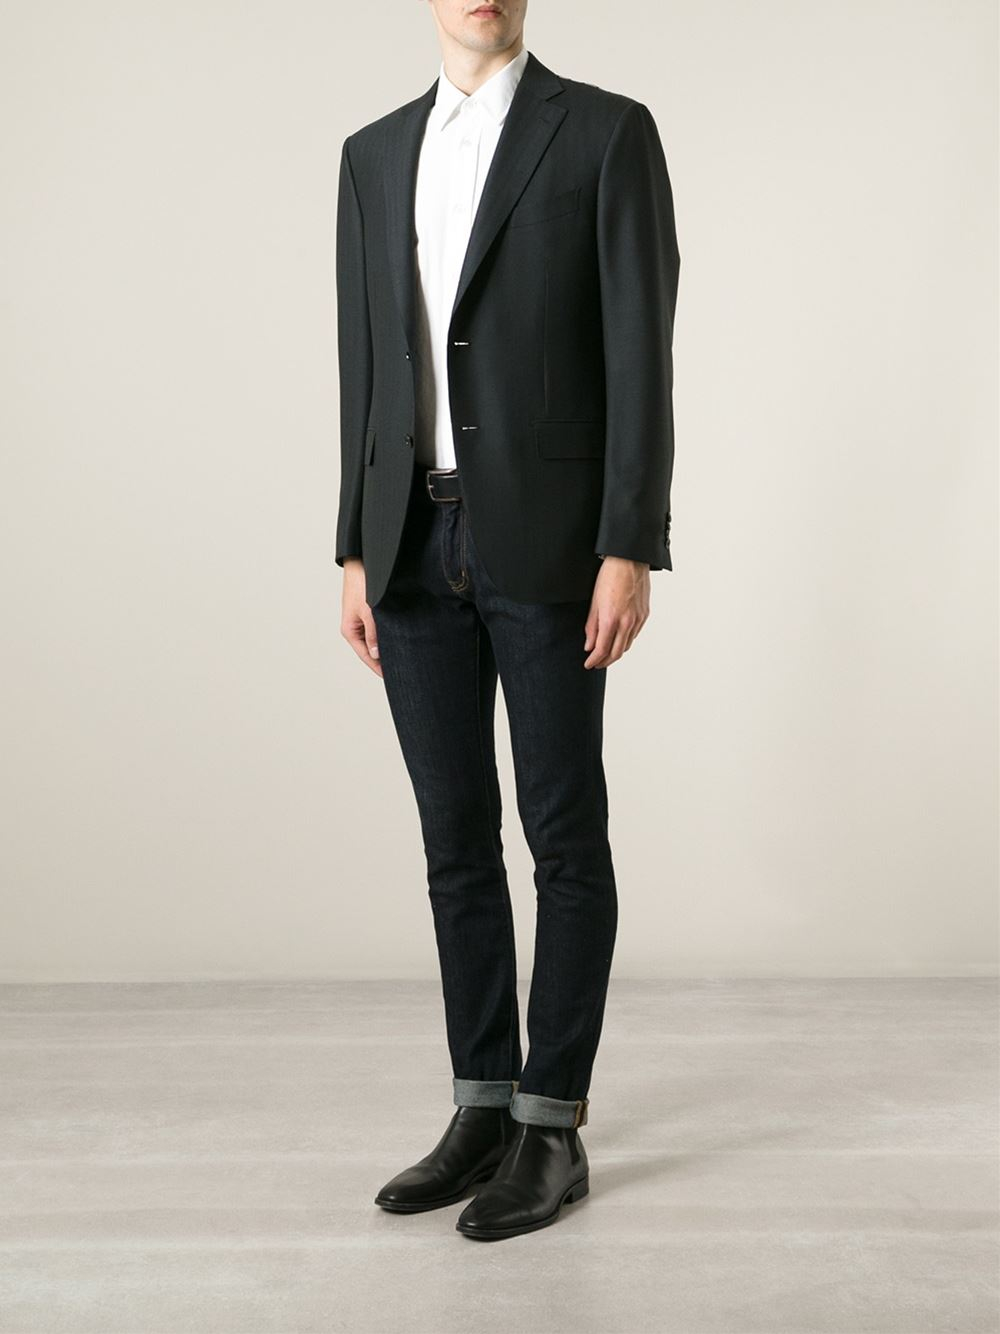 Ermenegildo zegna Herringbone Blazer in Black for Men   Lyst